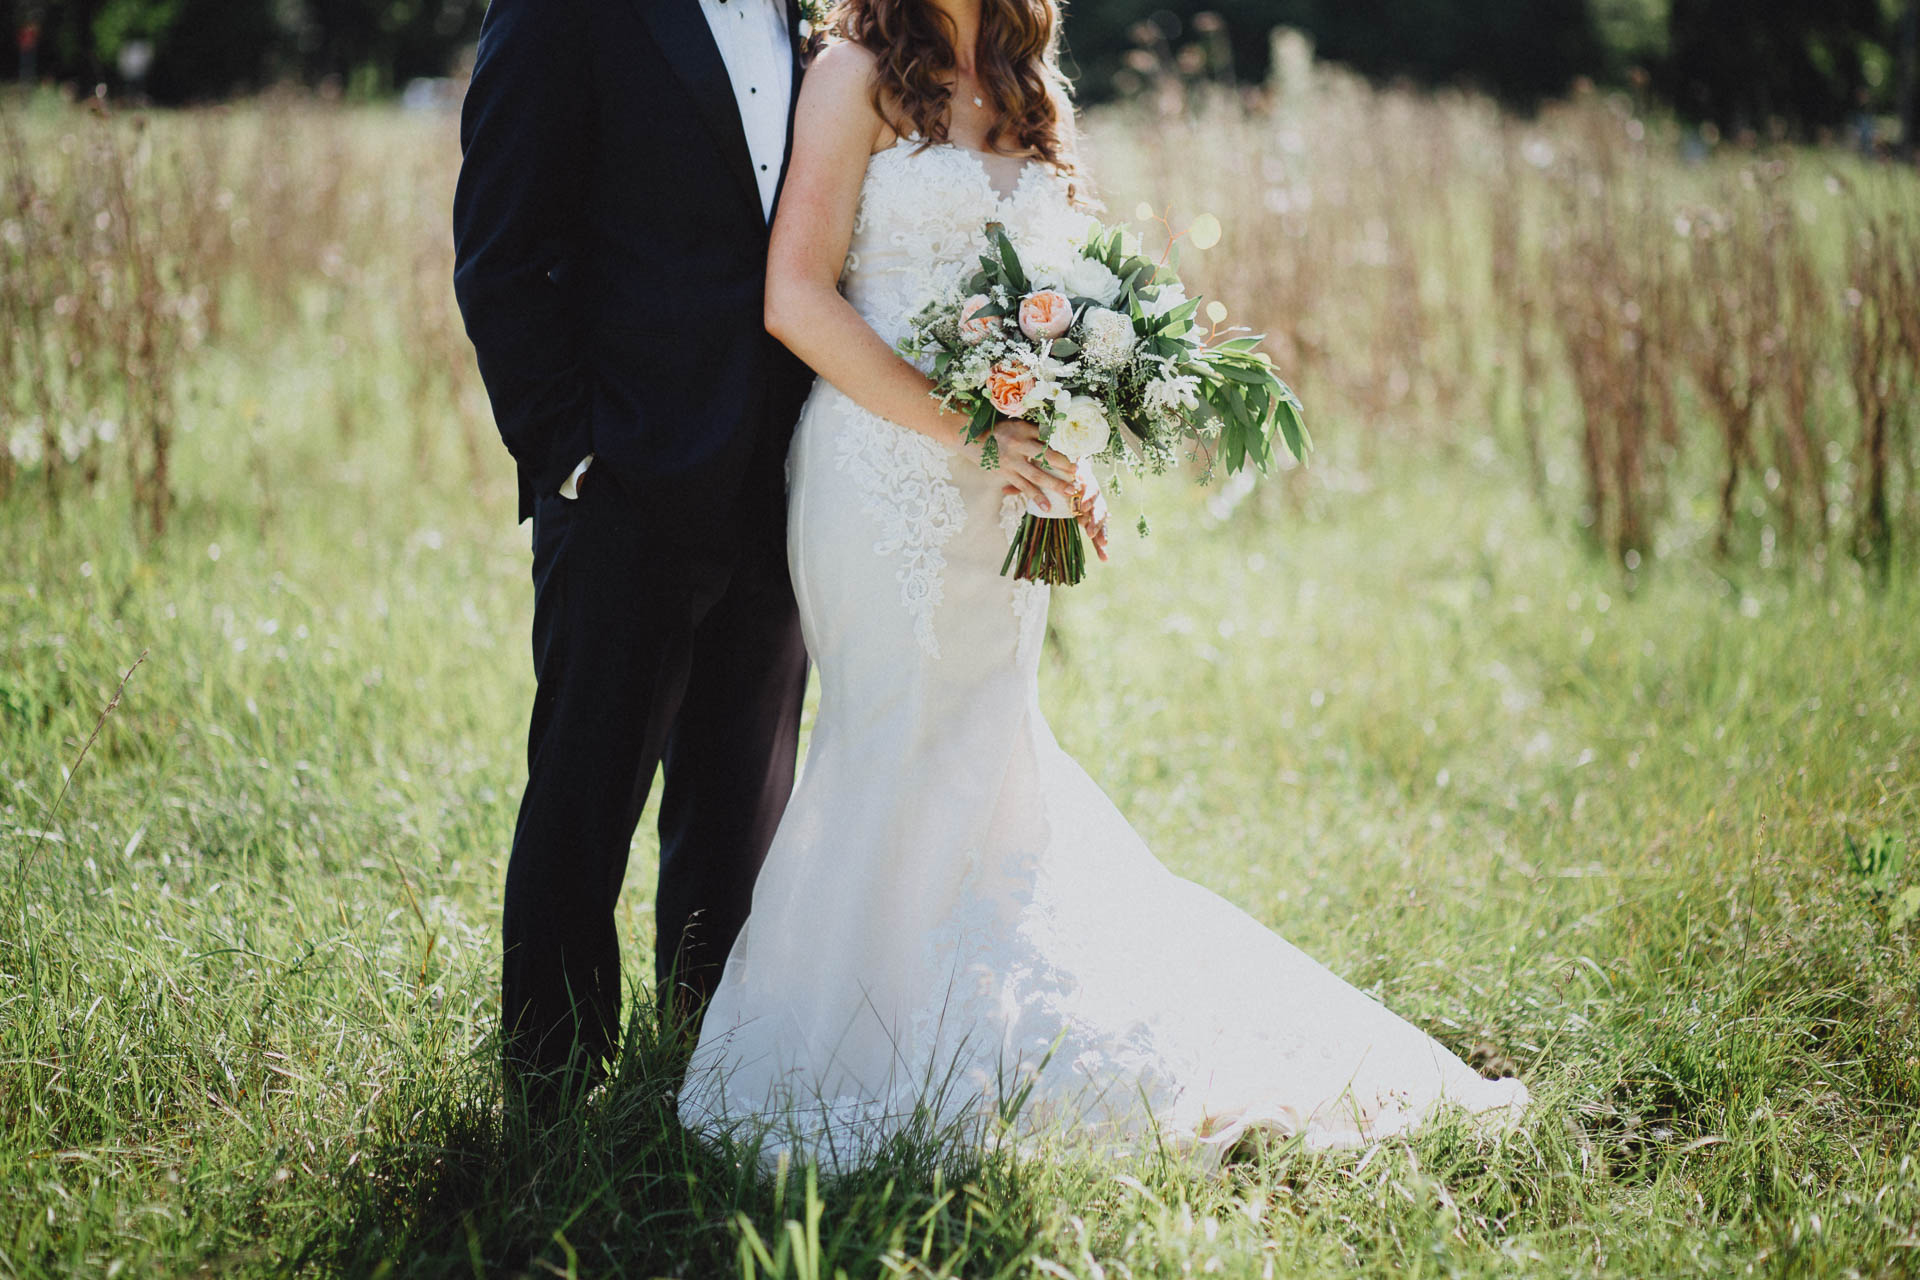 Keri-Joseph-Top-of-the-Market-Wedding-122@2x.jpg